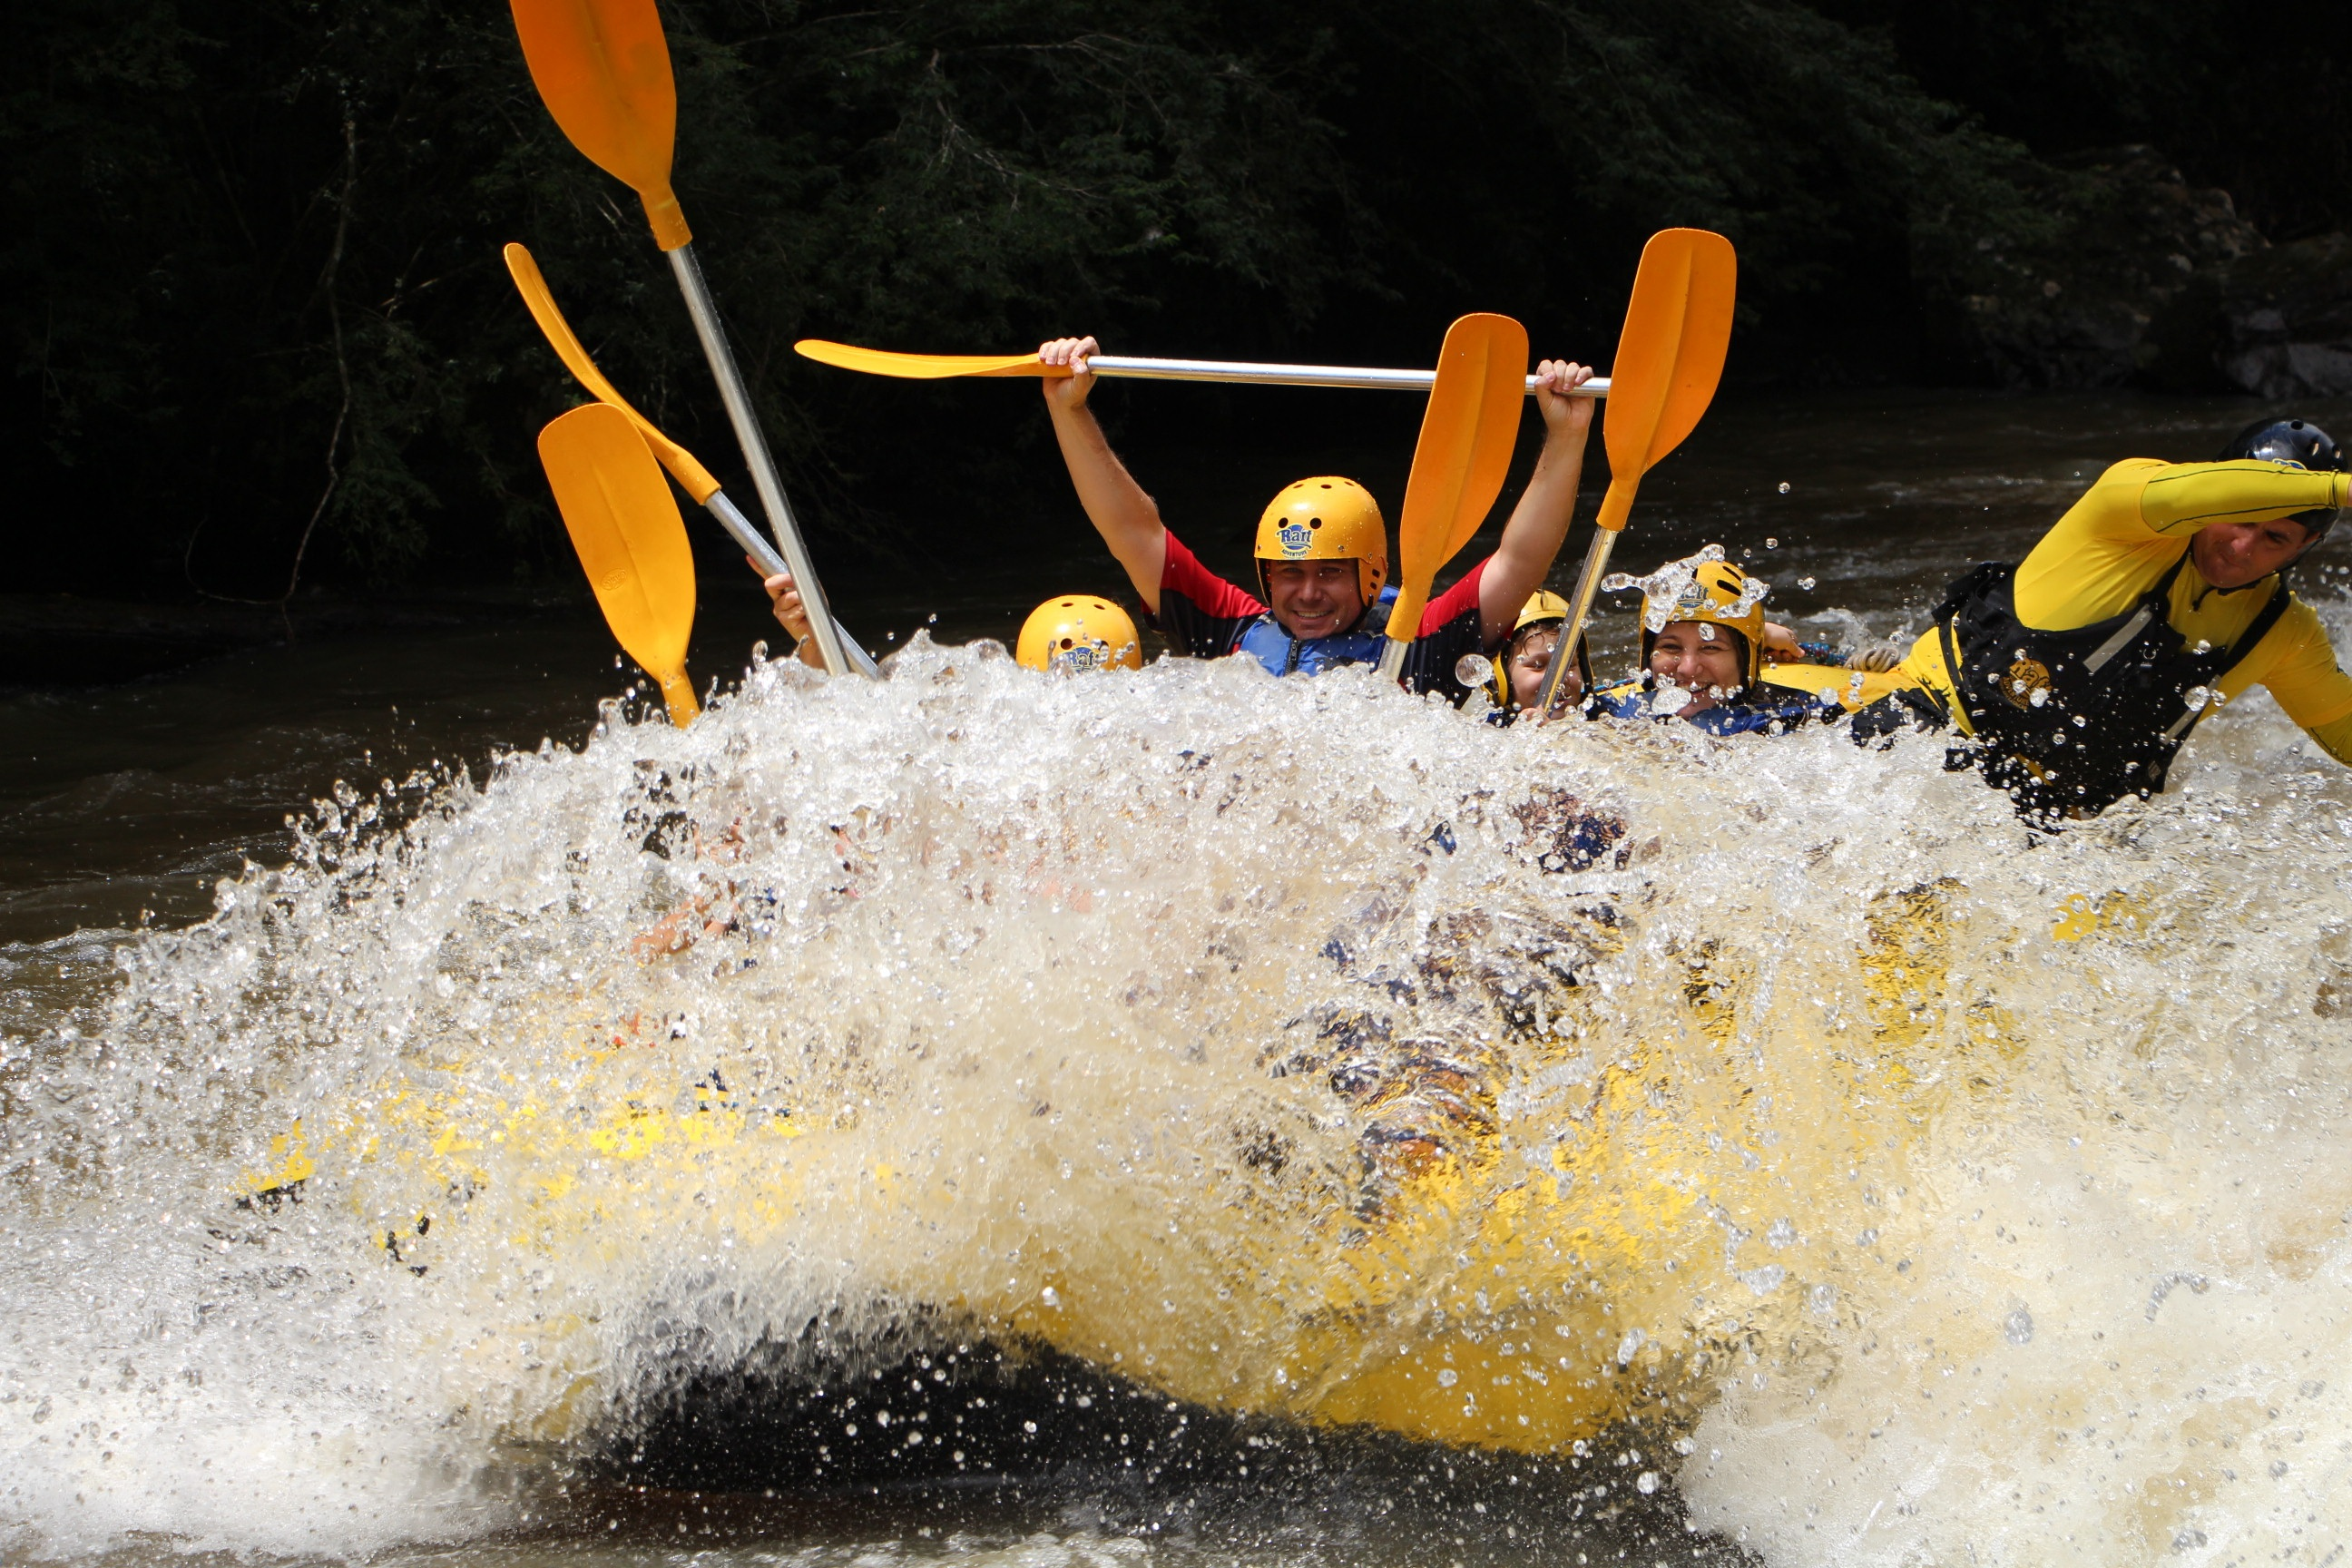 Fun white water rafting in an inflatable raft HD Wallpaper 2592x1728